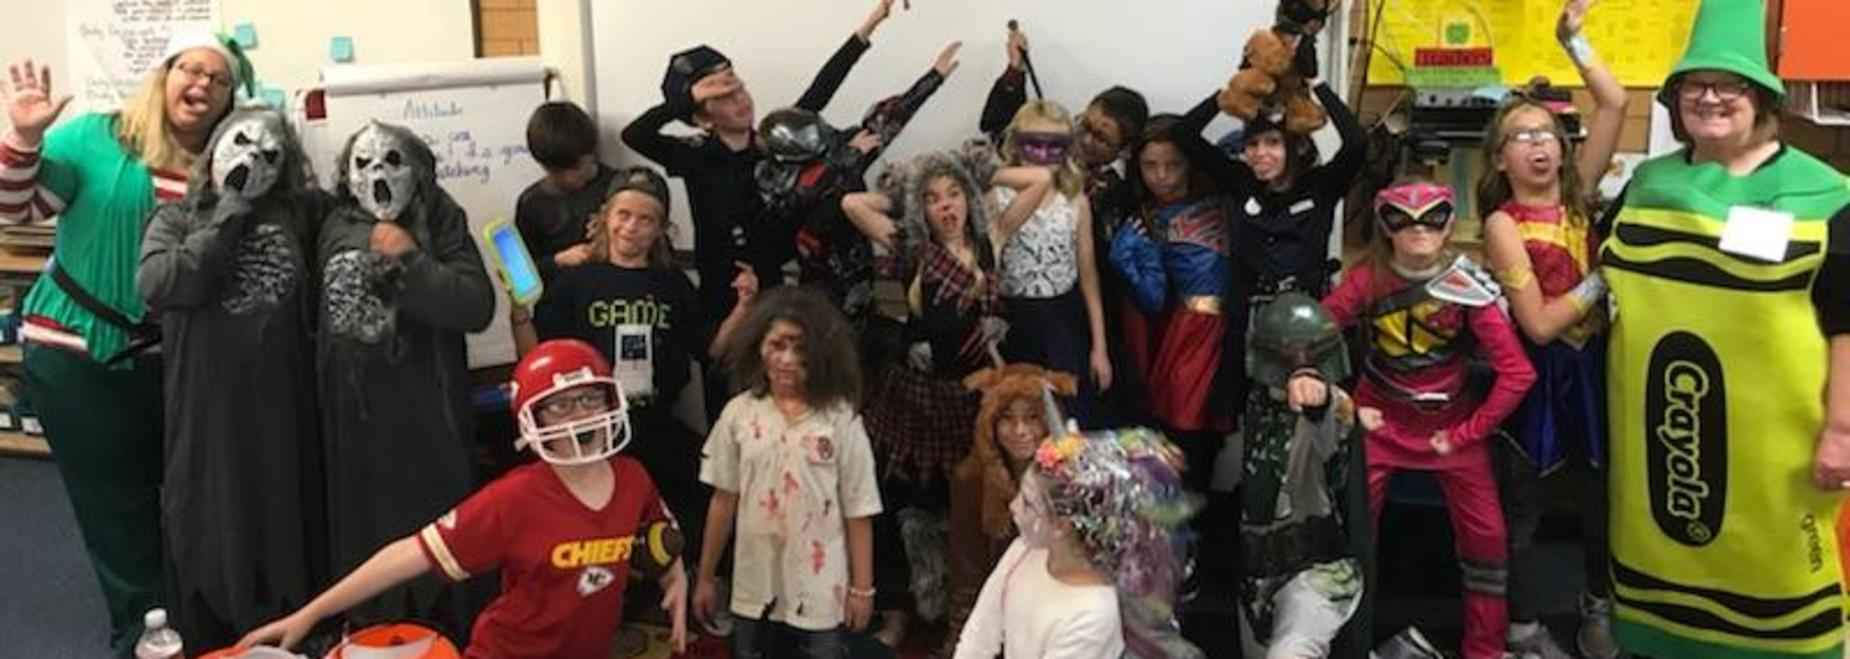 Mrs. Shea's Fun Halloween Party!